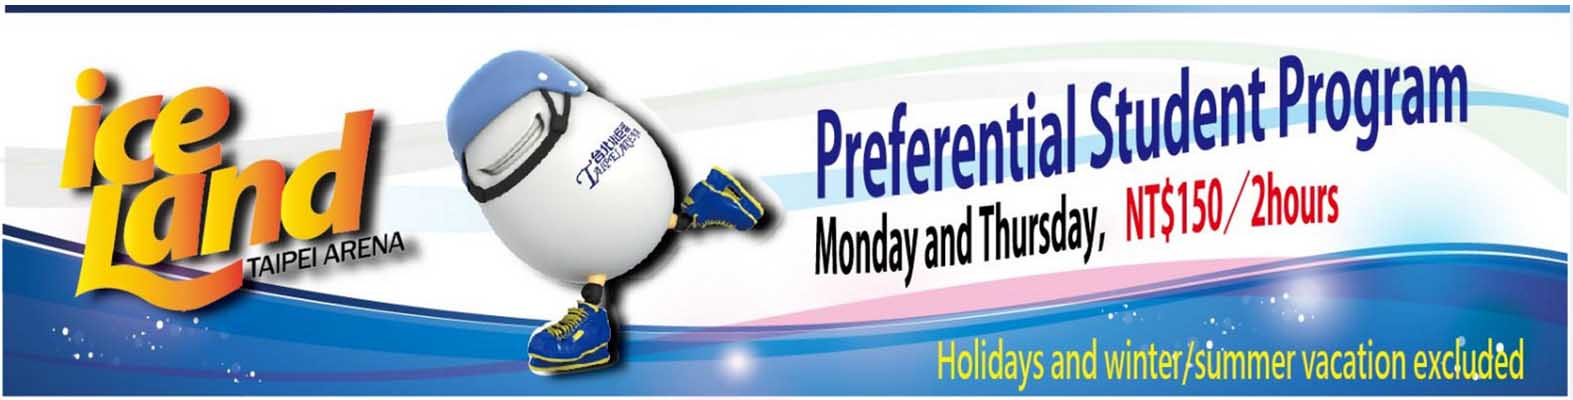 Preferential Student Program